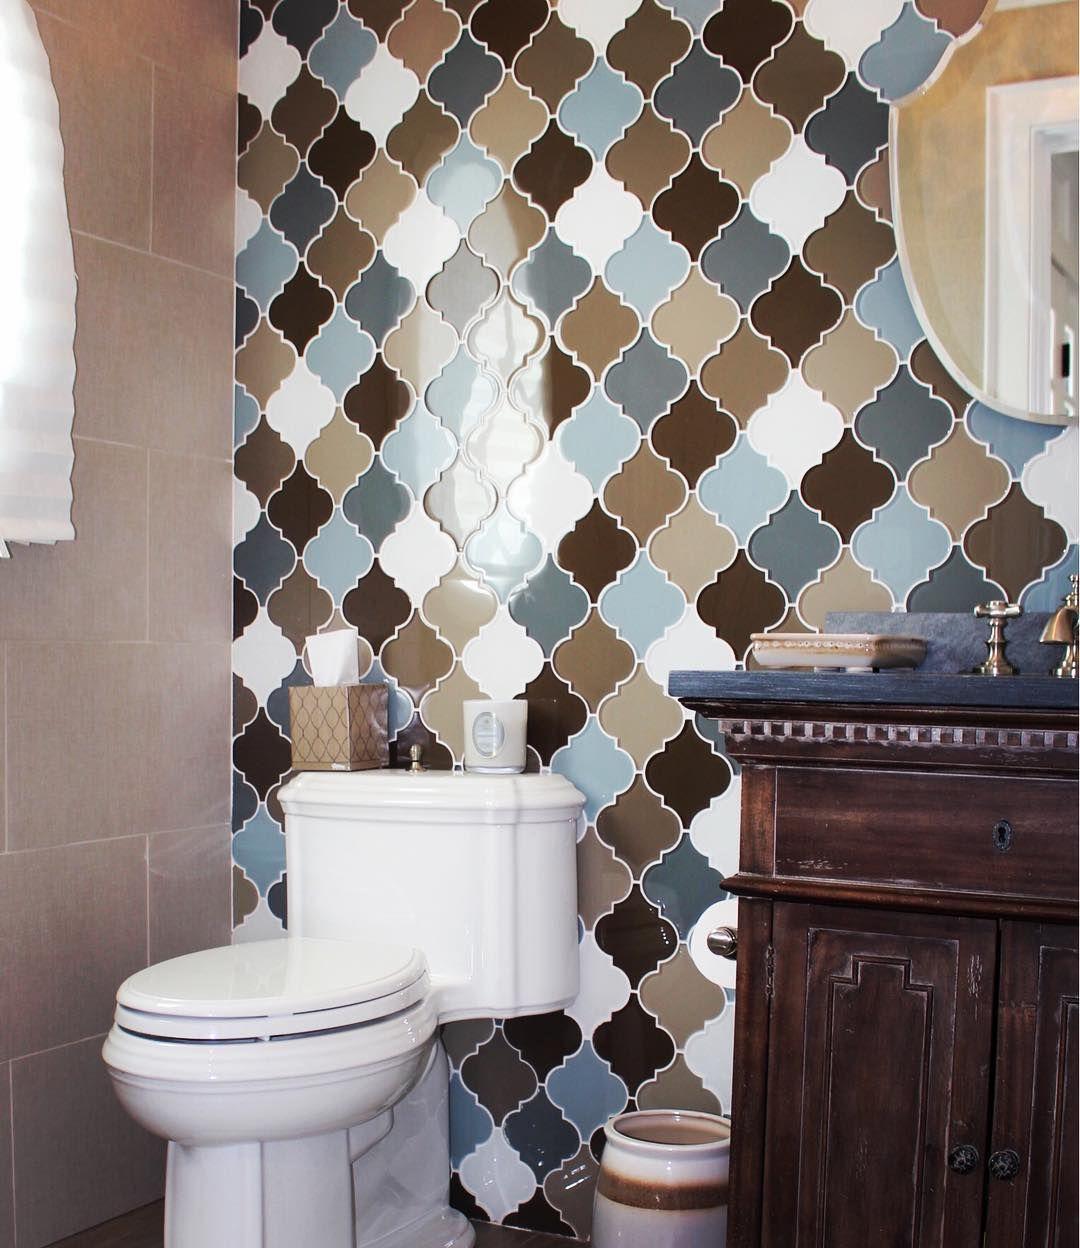 Houzz guest bathrooms - Guest Bathroom Arabesque Glass Tileaddiction Instatiles Interiordesign Houzz Kitchen